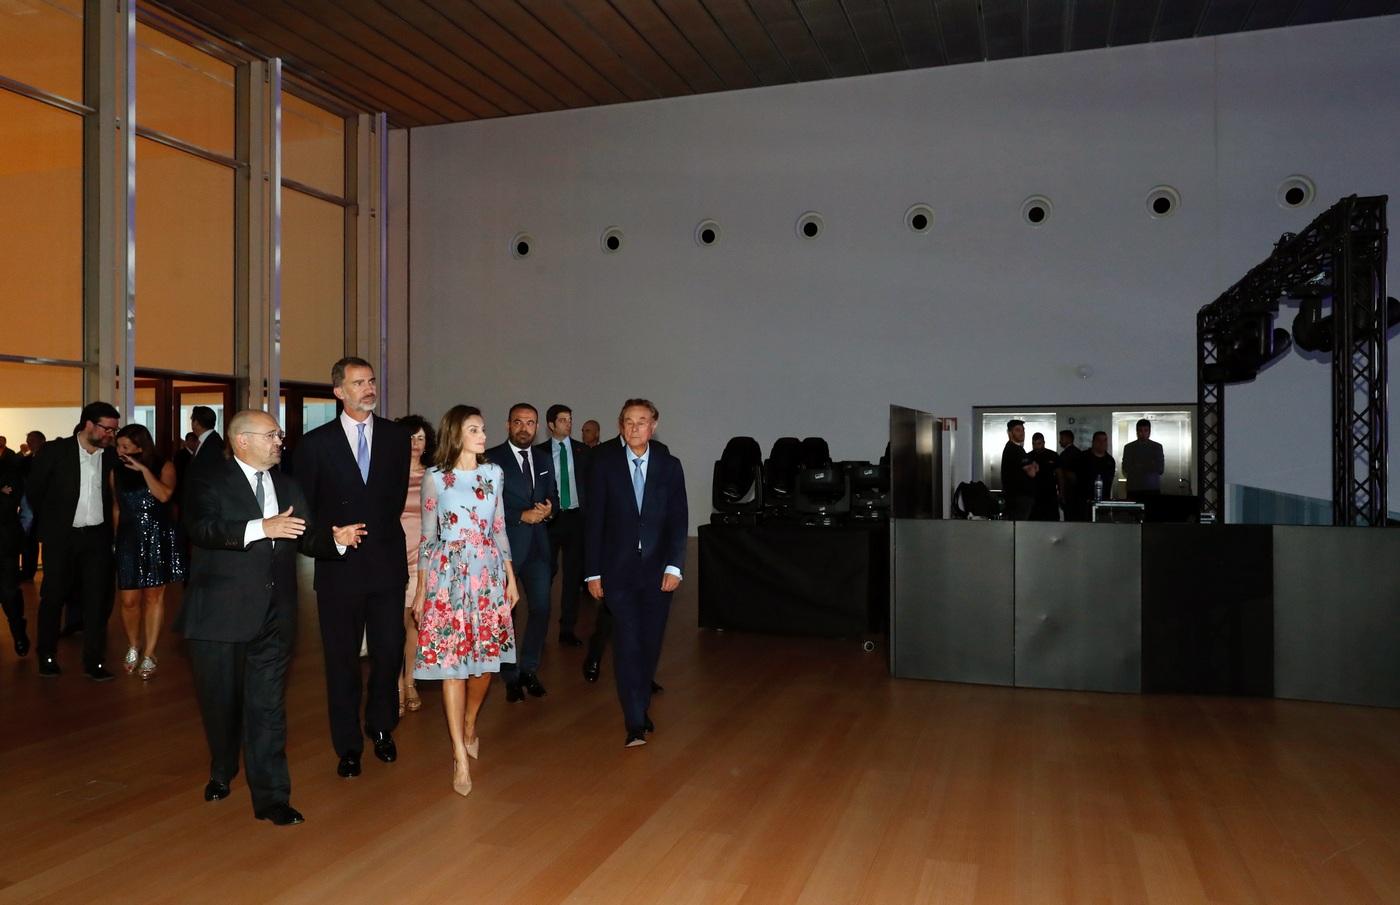 reyes_palma_inauguracion_palacio_congresos_20170925_03